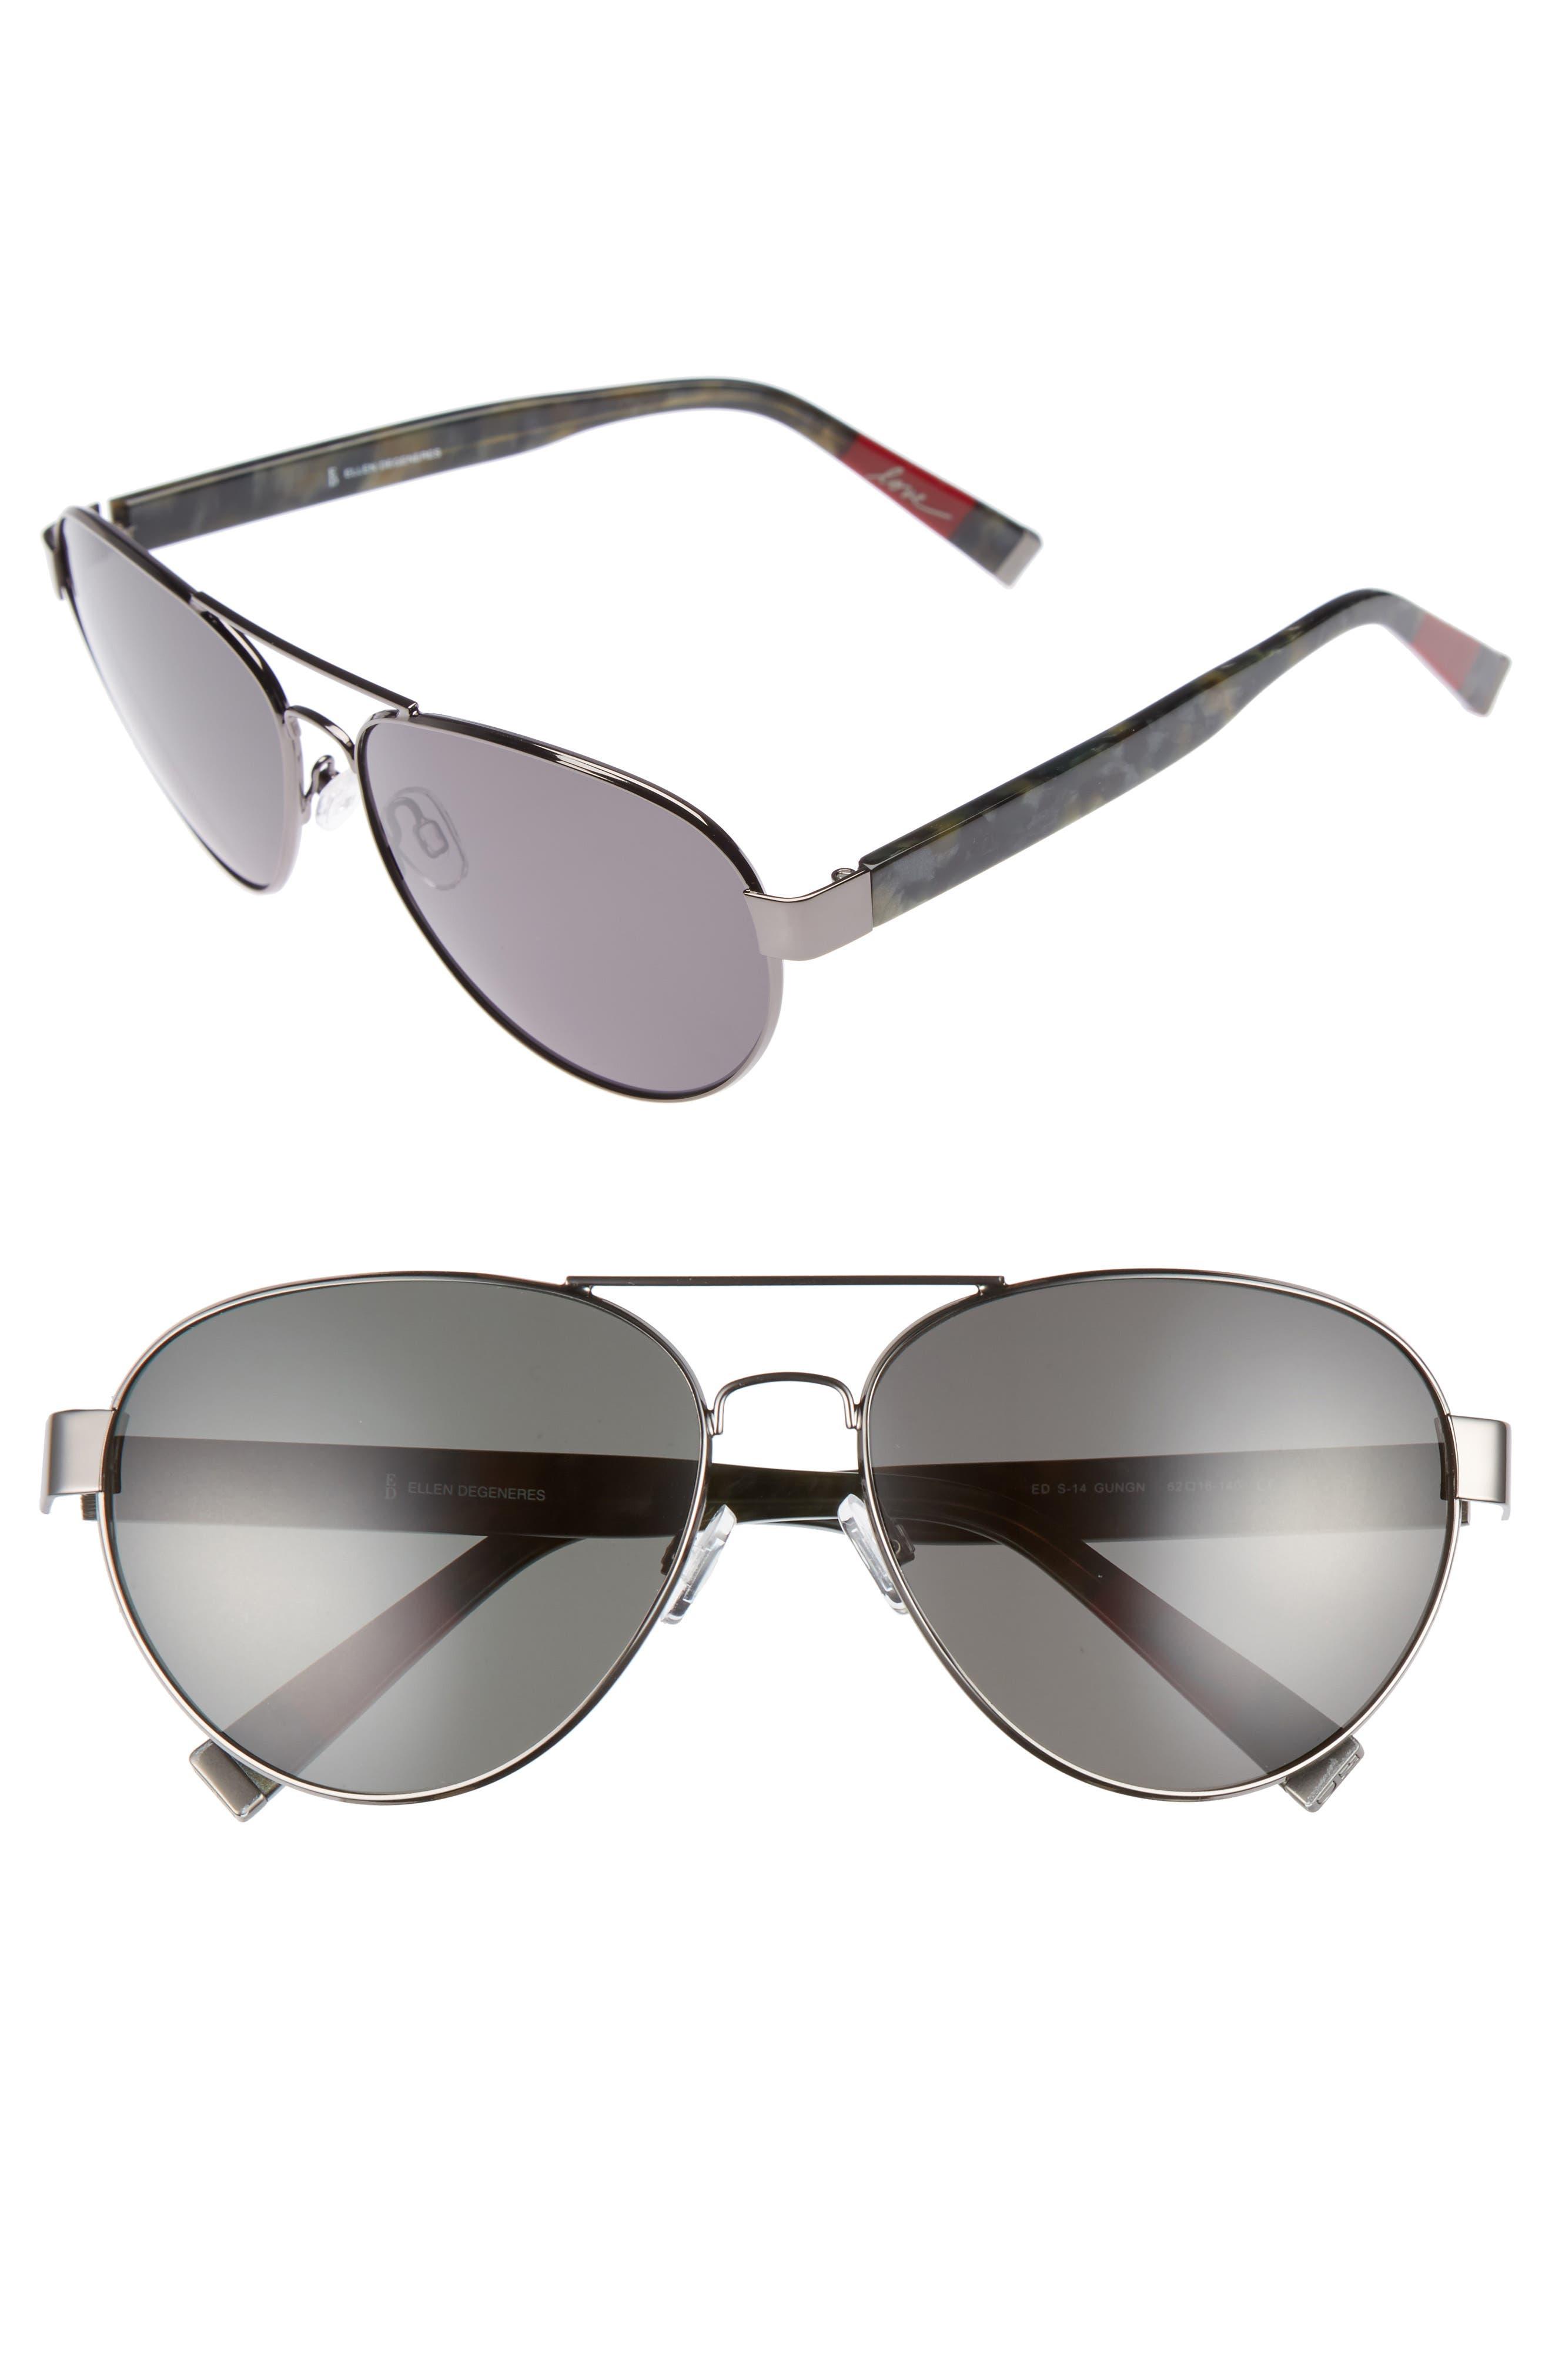 Main Image - ED Ellen DeGeneres 62mm Oversize Aviator Sunglasses